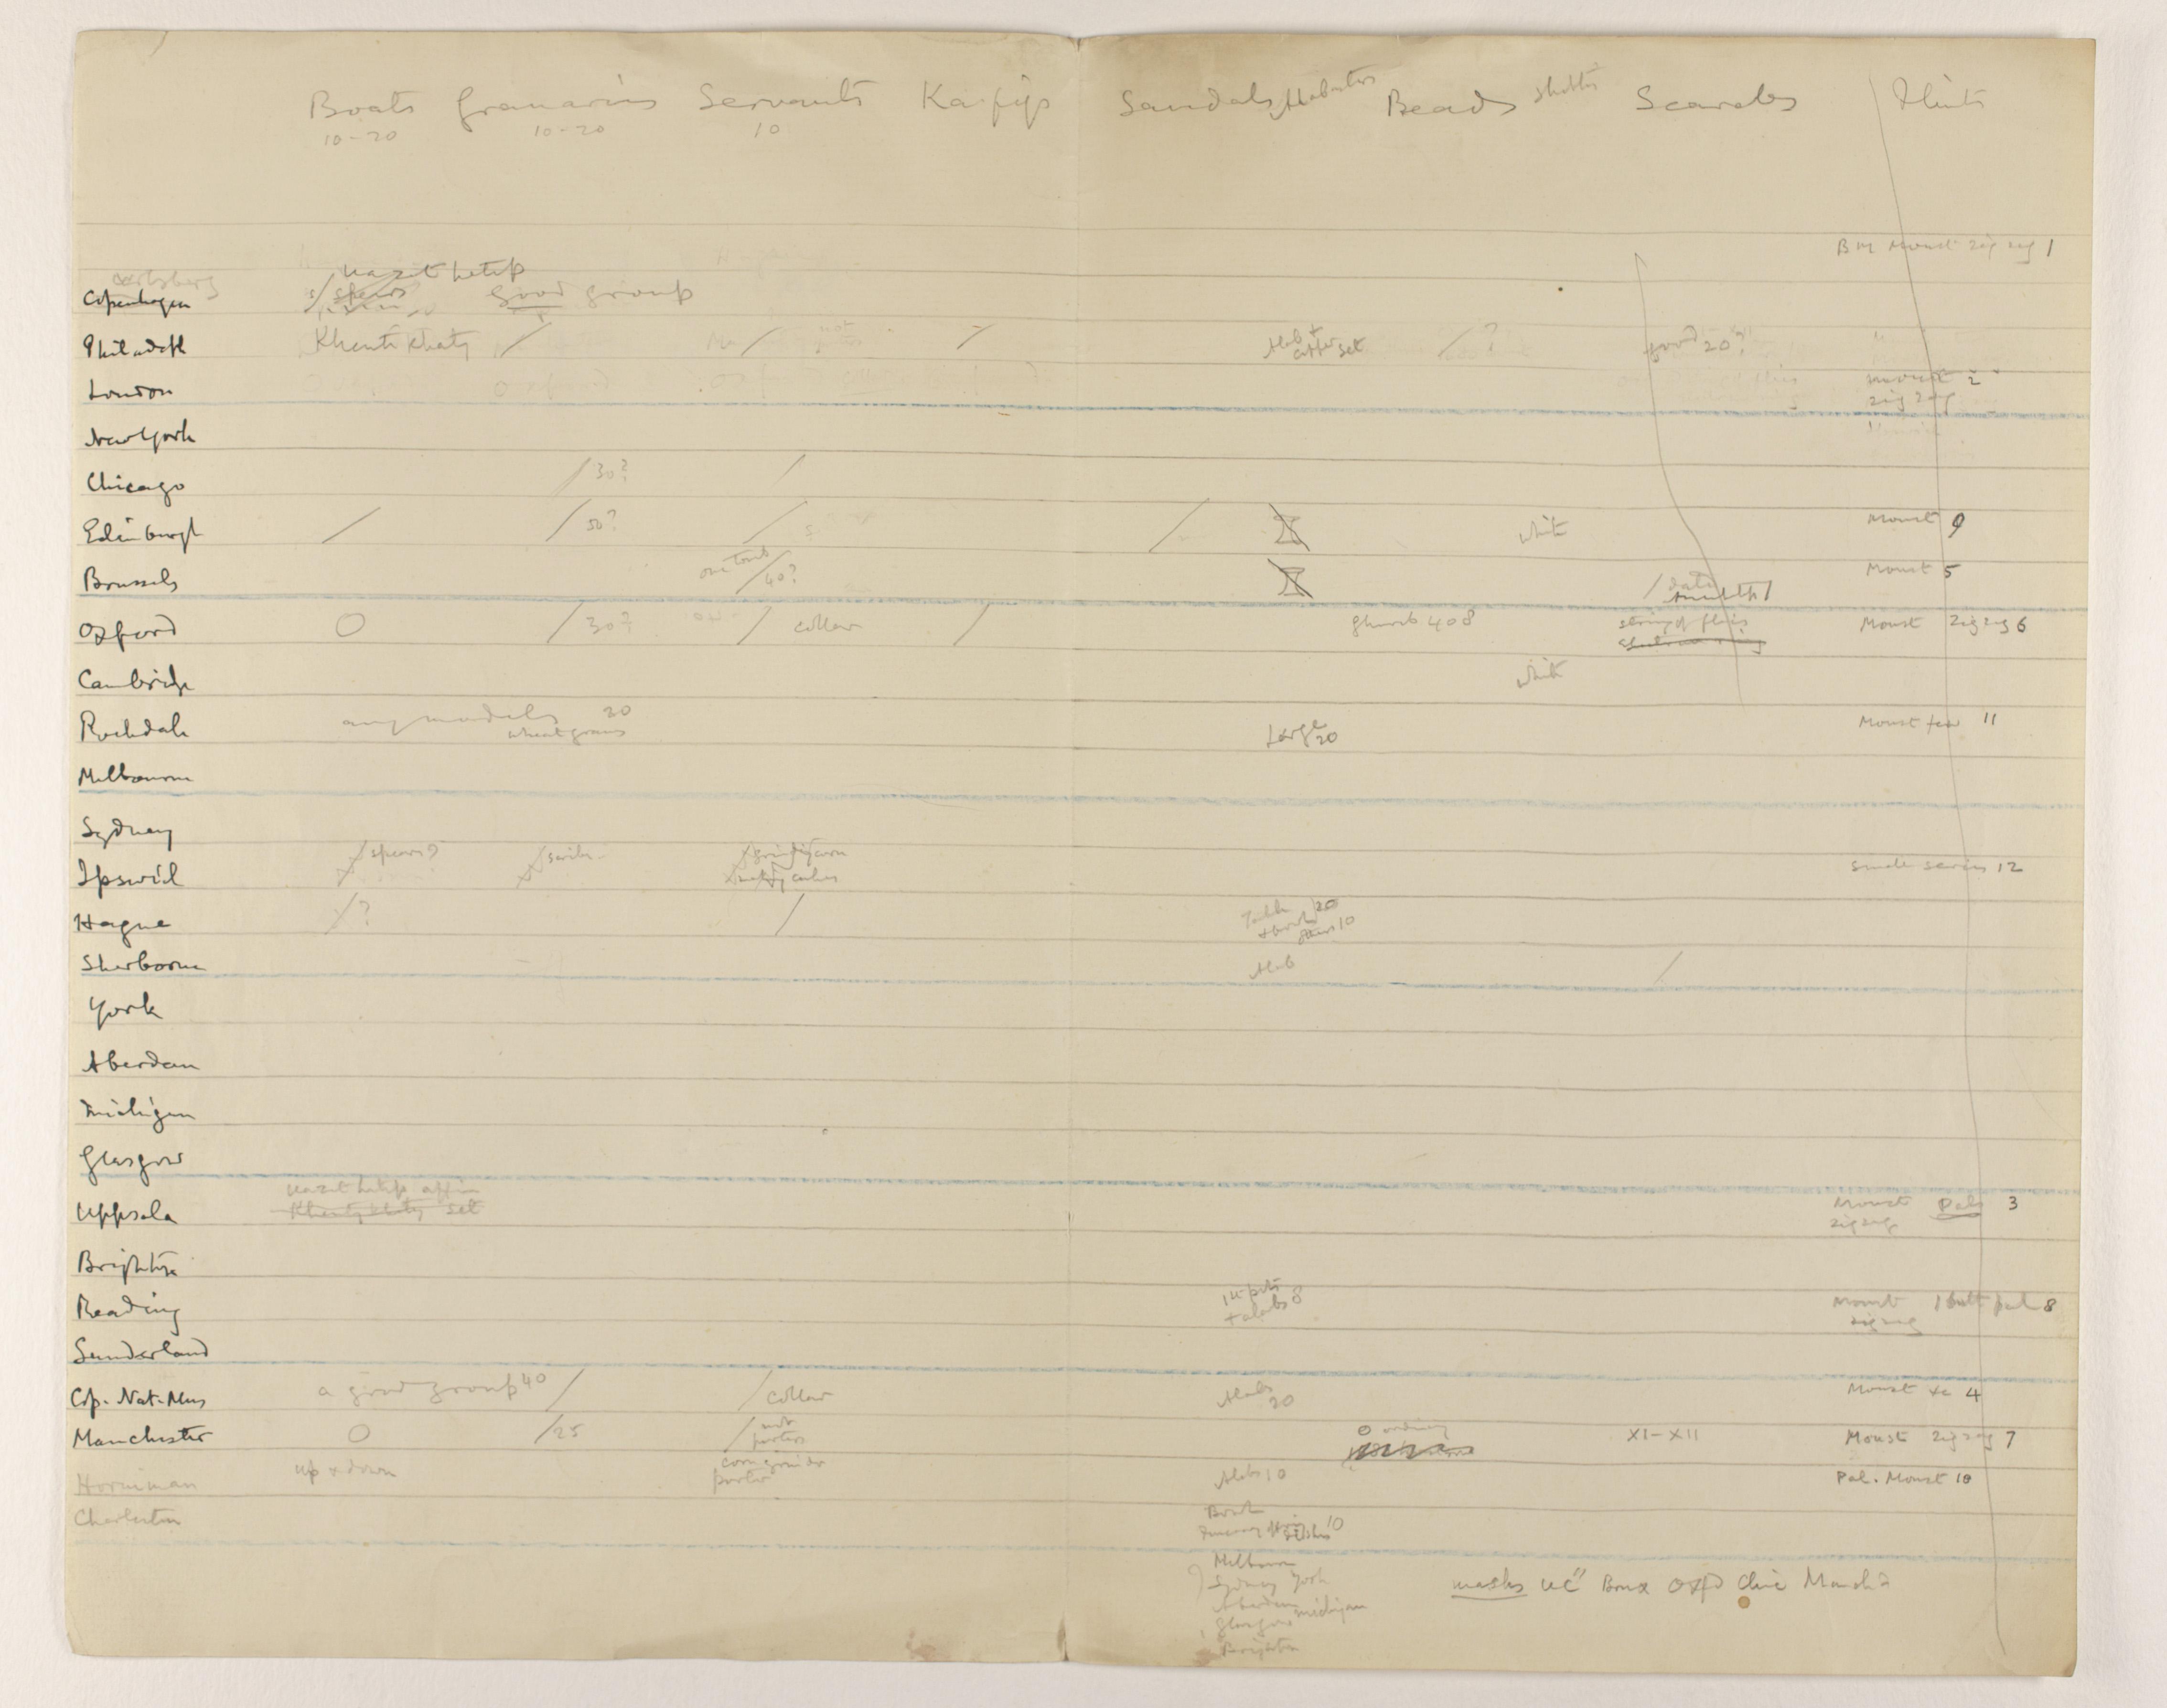 1919-21 Sedment, Lahun Distribution grid PMA/WFP1/D/24/7.1